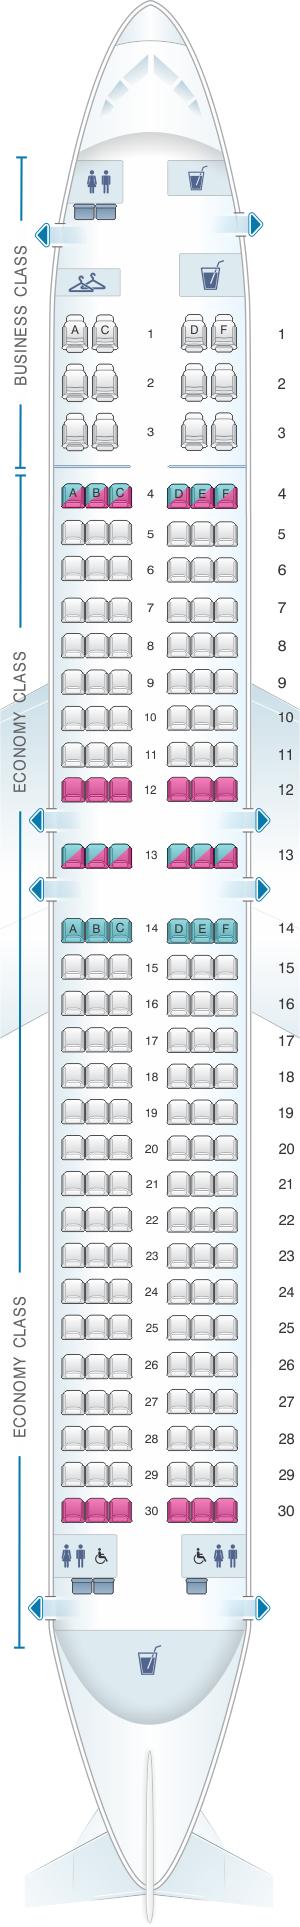 Seat map for Qantas Airways Boeing B737 800 174PAX